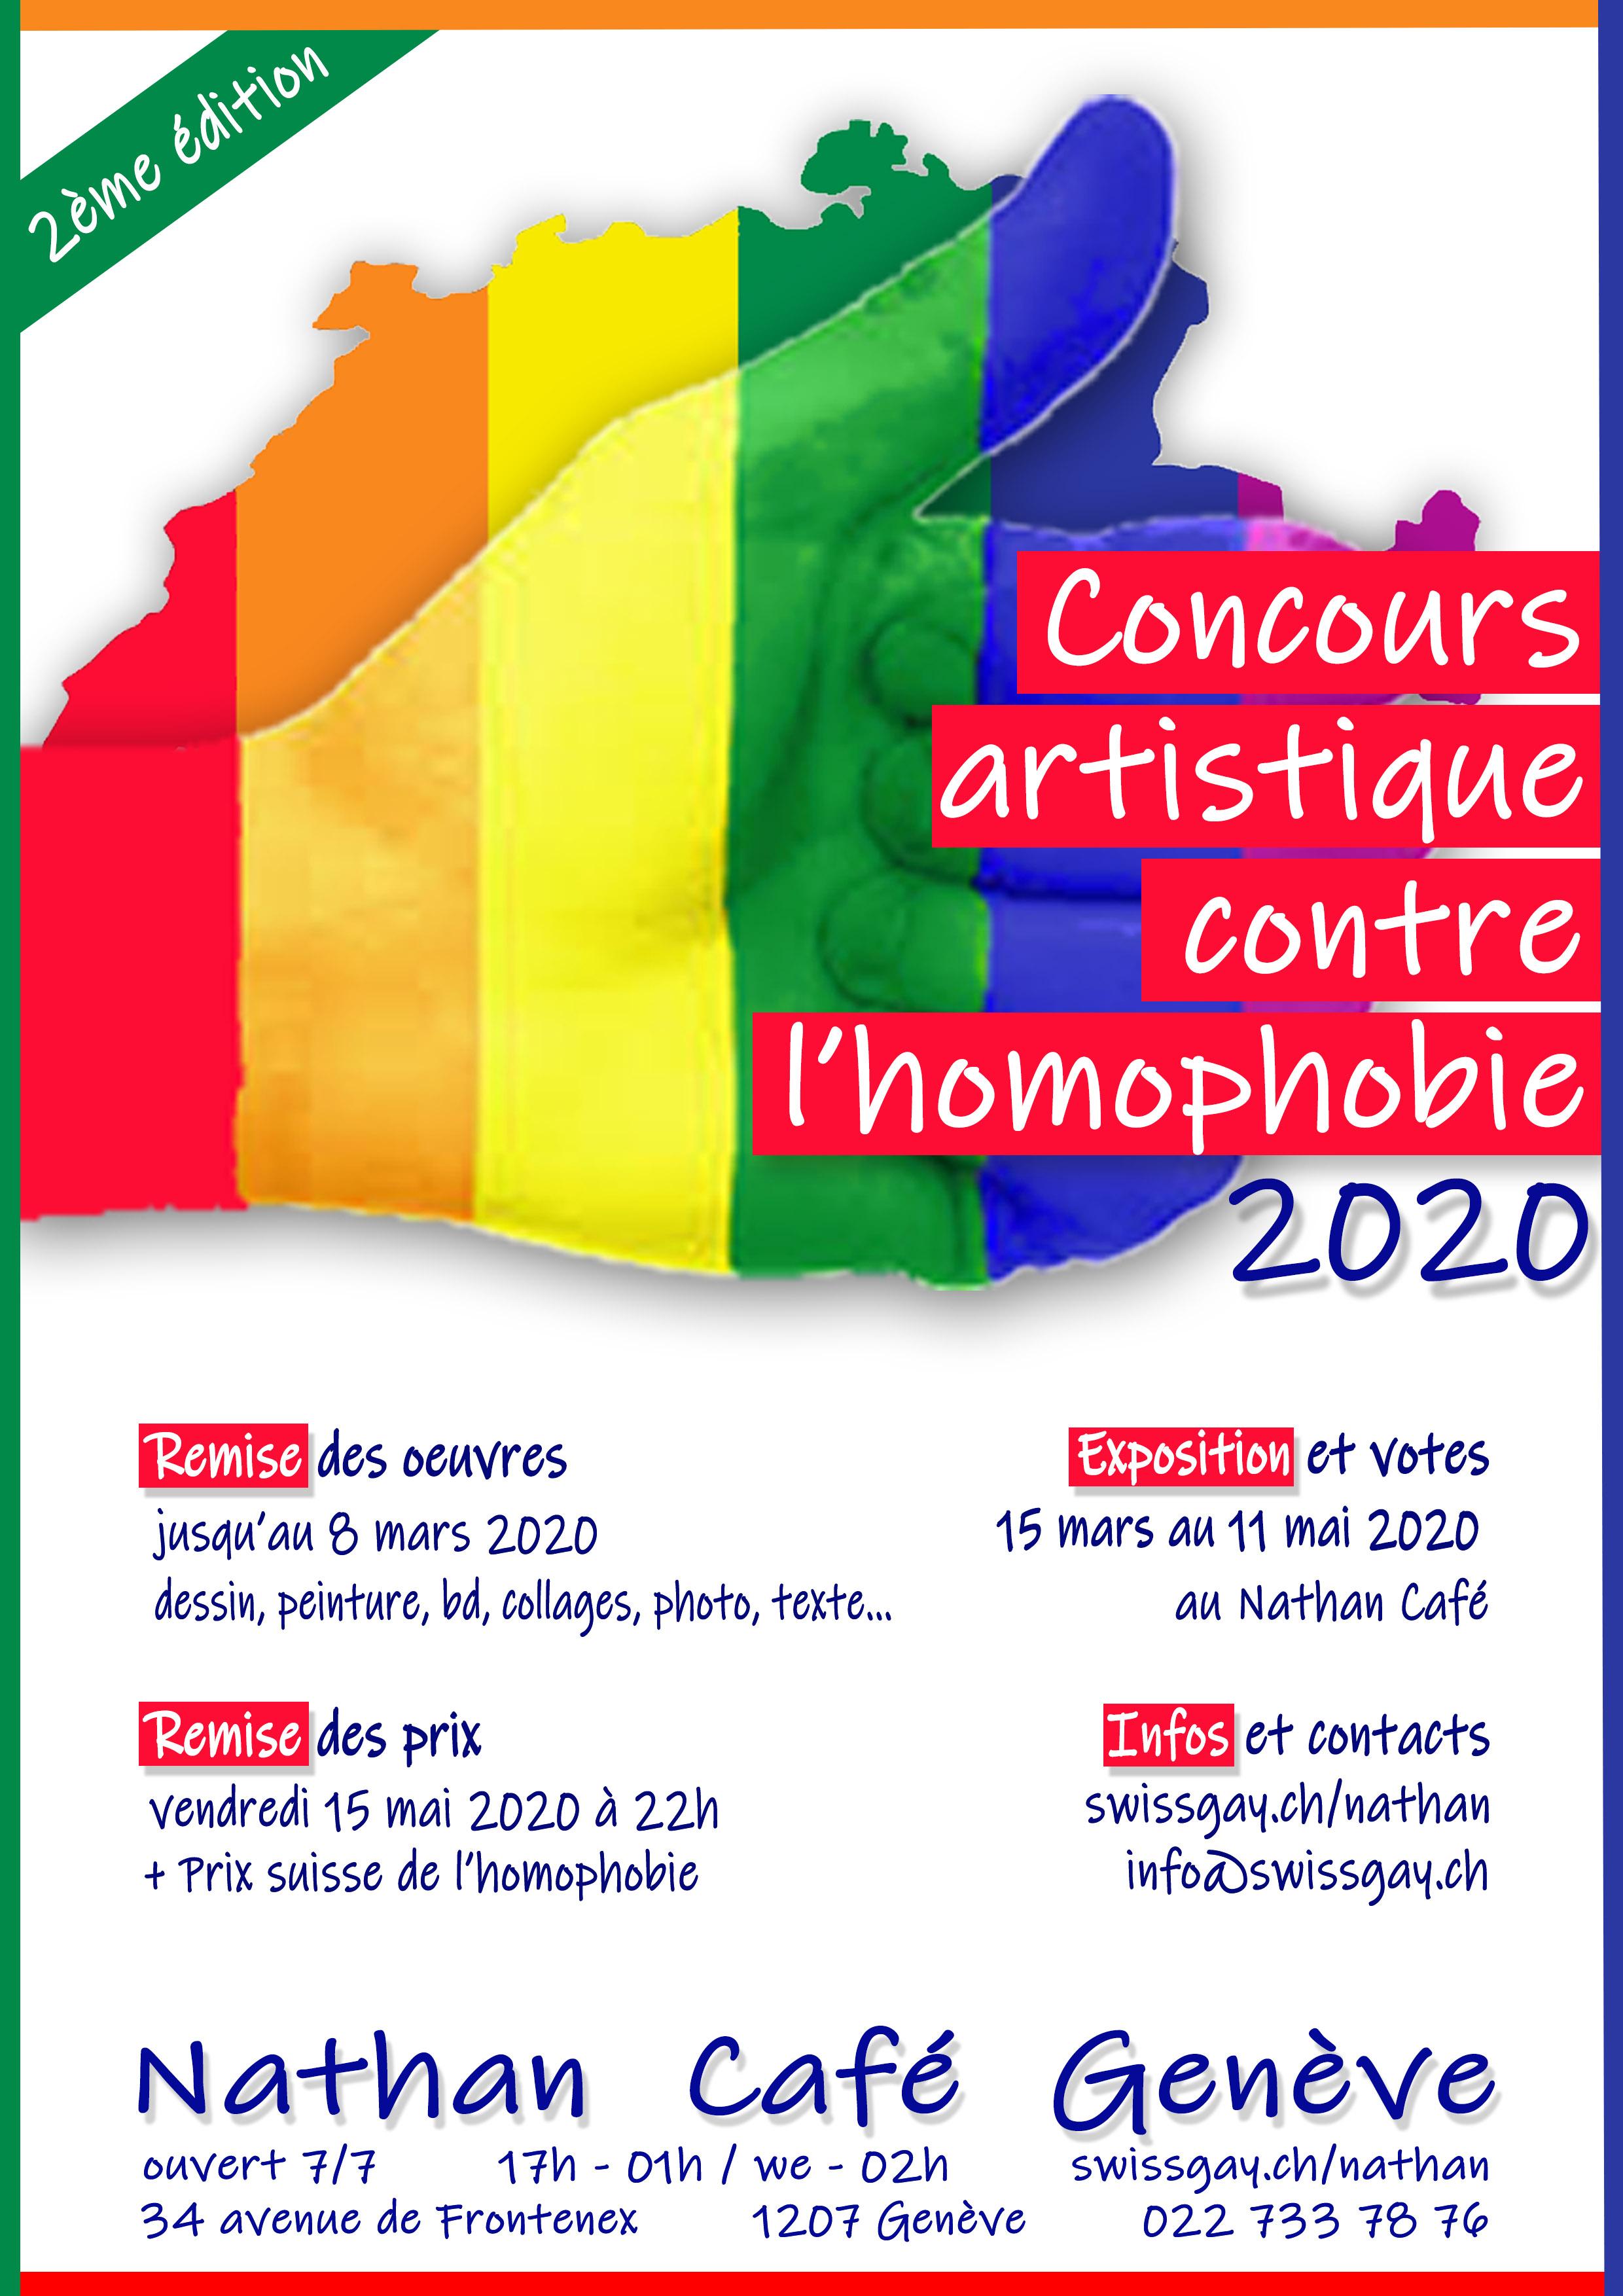 Nathan Café - Concours artistique contre l'homophobie 2020